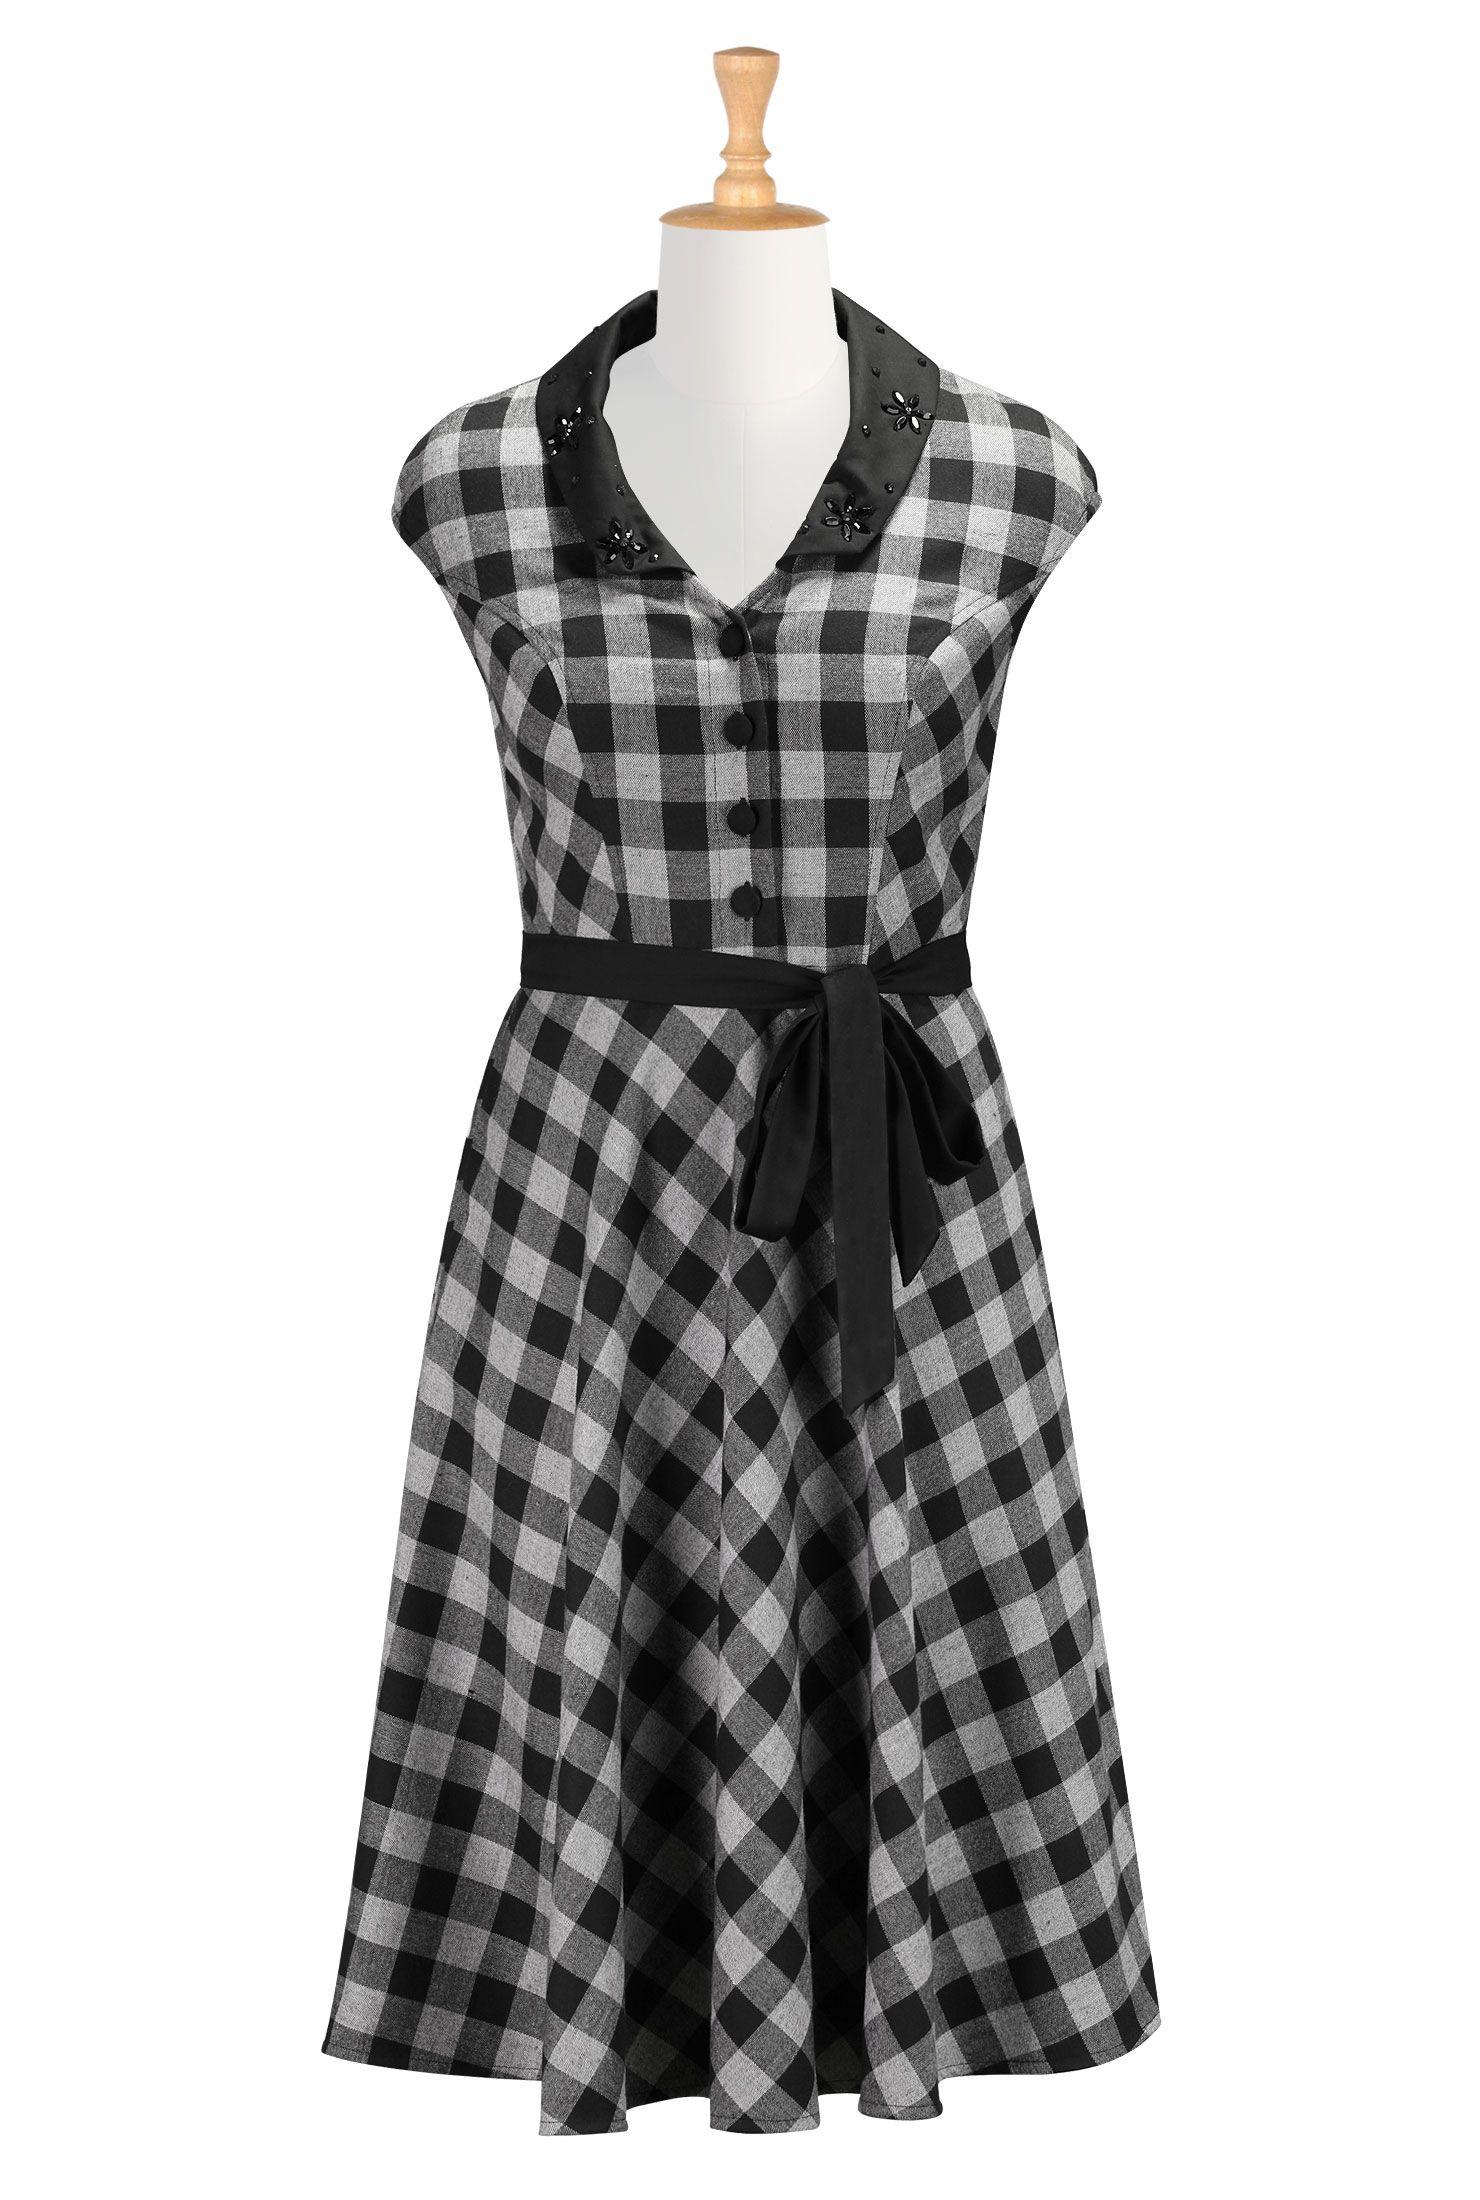 66b94d65579c Beaded Collar Dresses